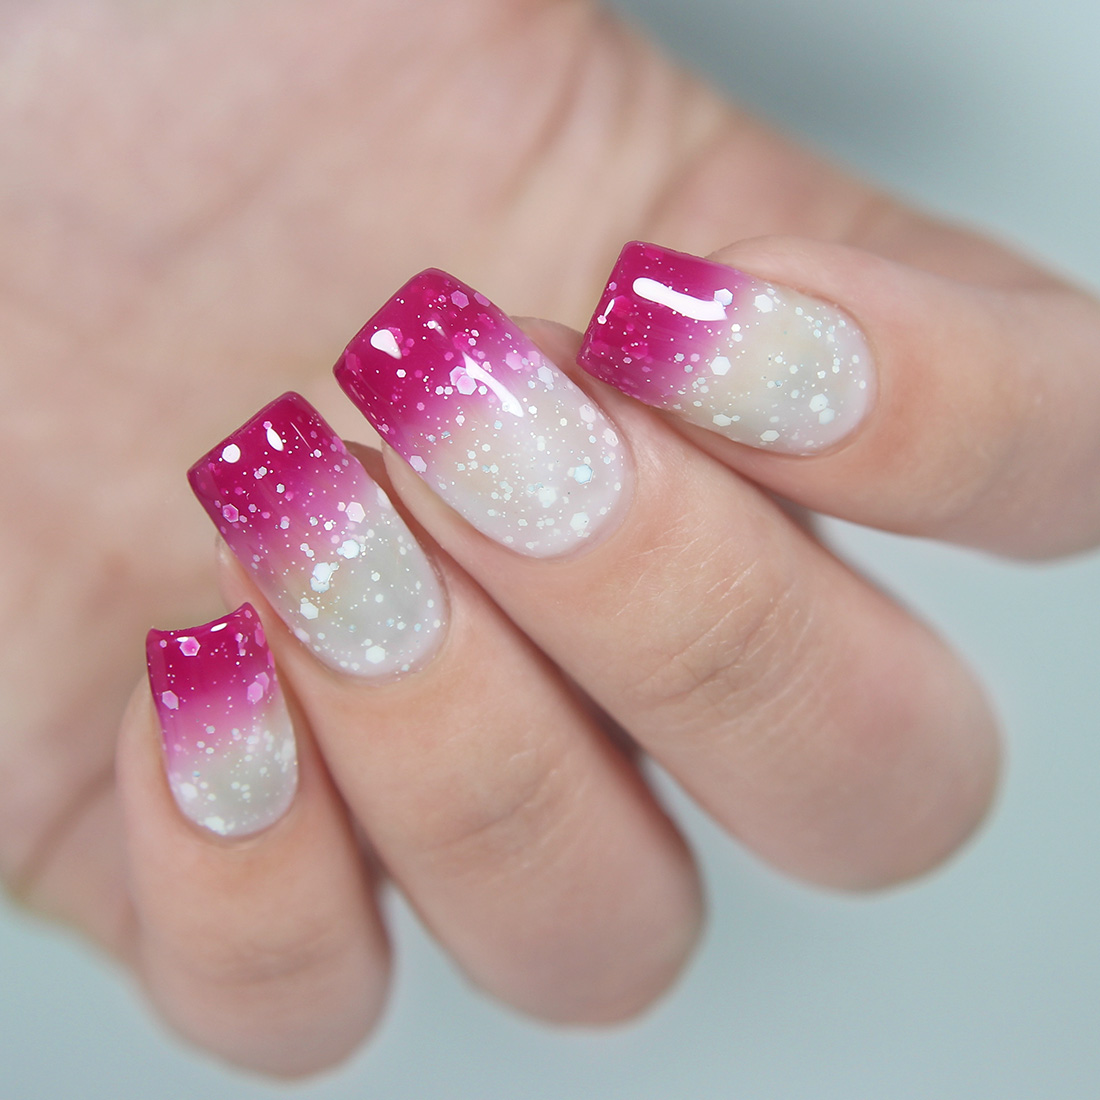 Gel Nail Polishes: BMC Thermal Color Changing Nail Lacquers Gel Polish